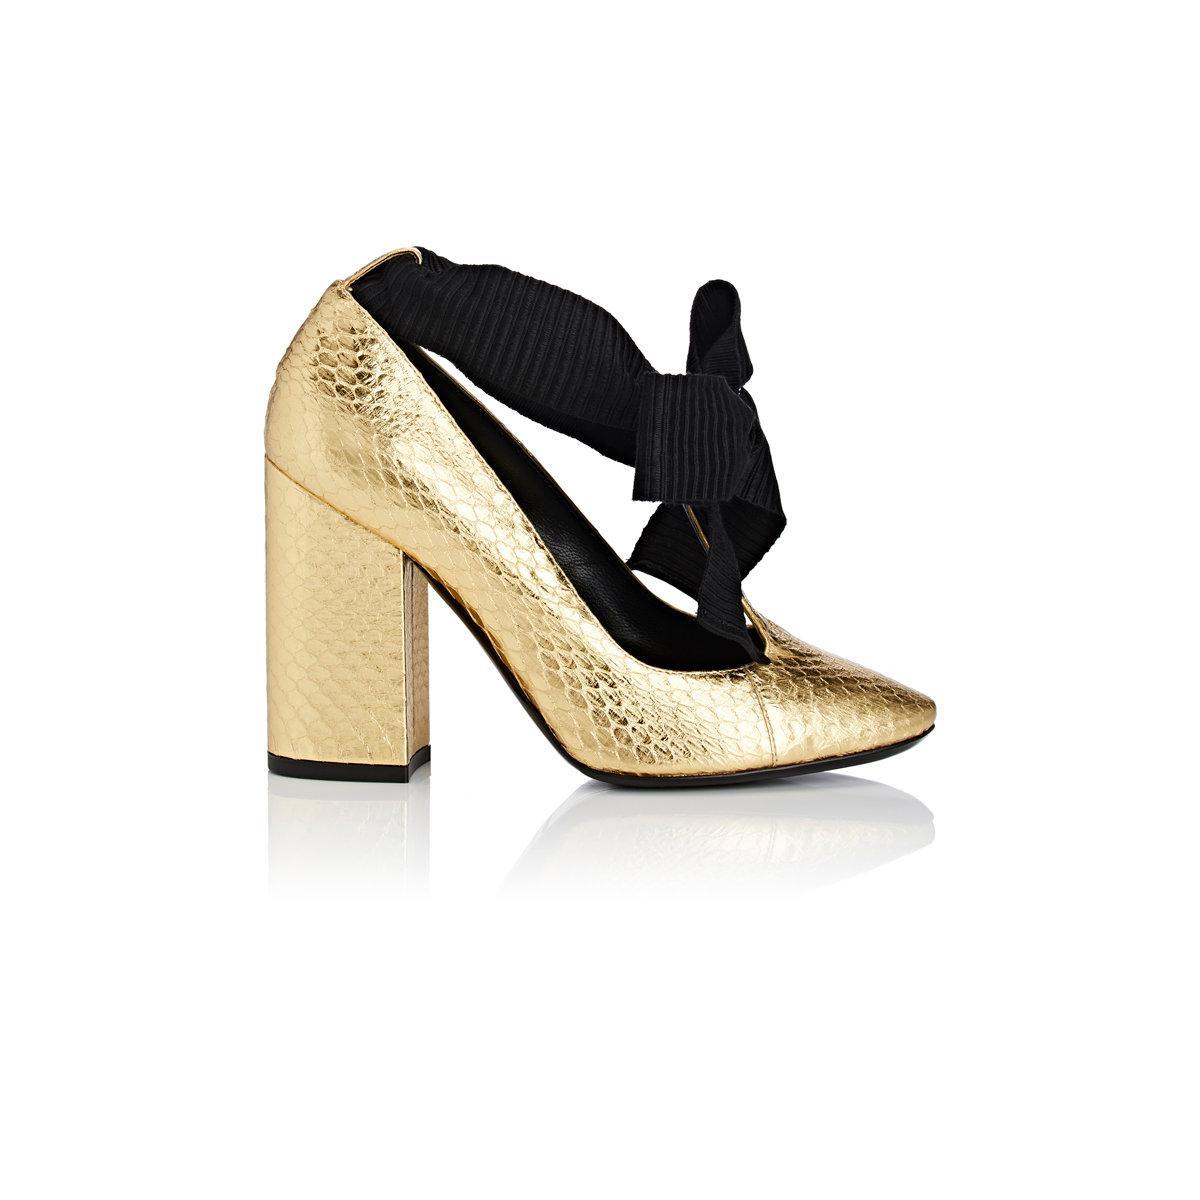 Chaussures - Piste Philosophie Di Lorenzo Serafini 15bMH